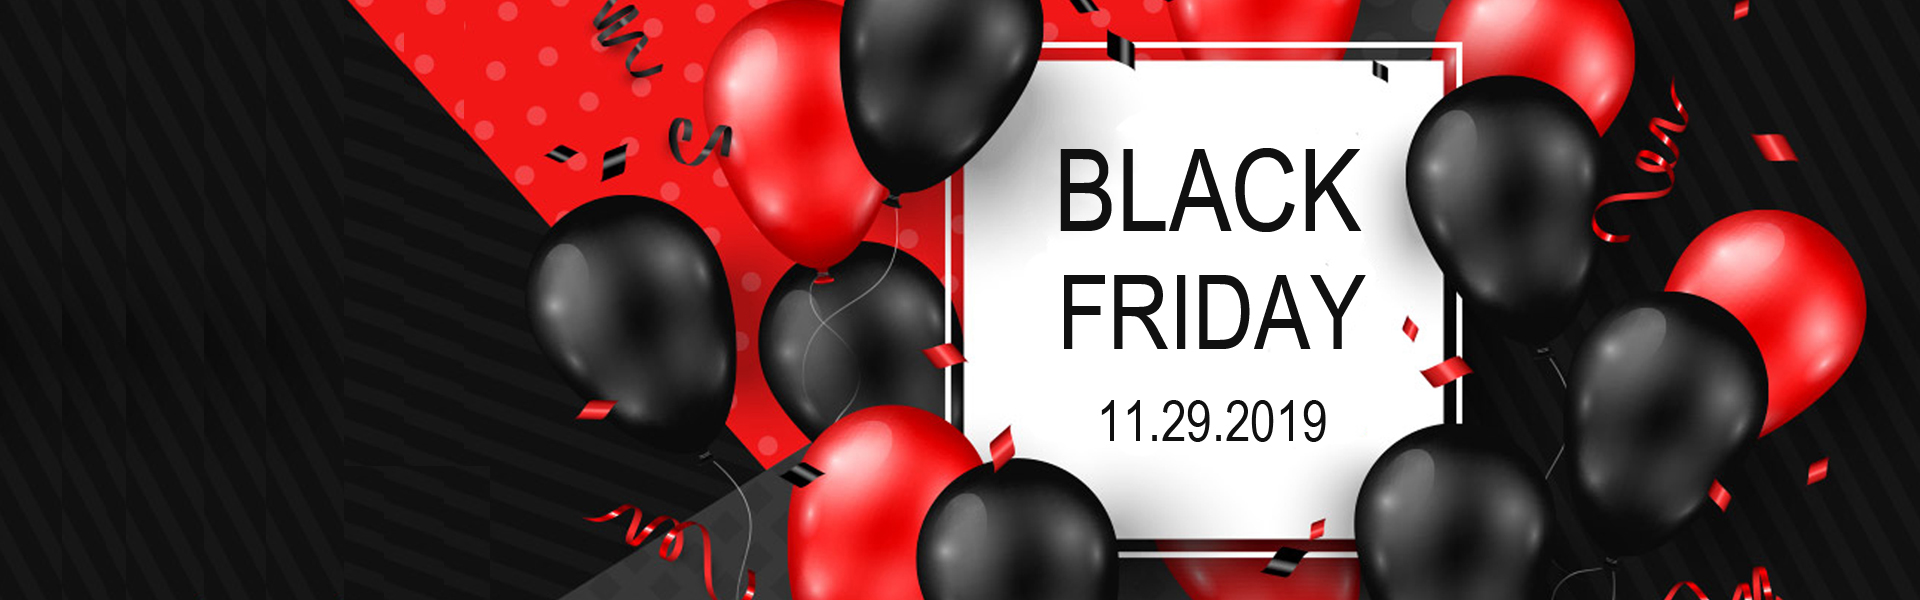 Black Friday Treedental 2019